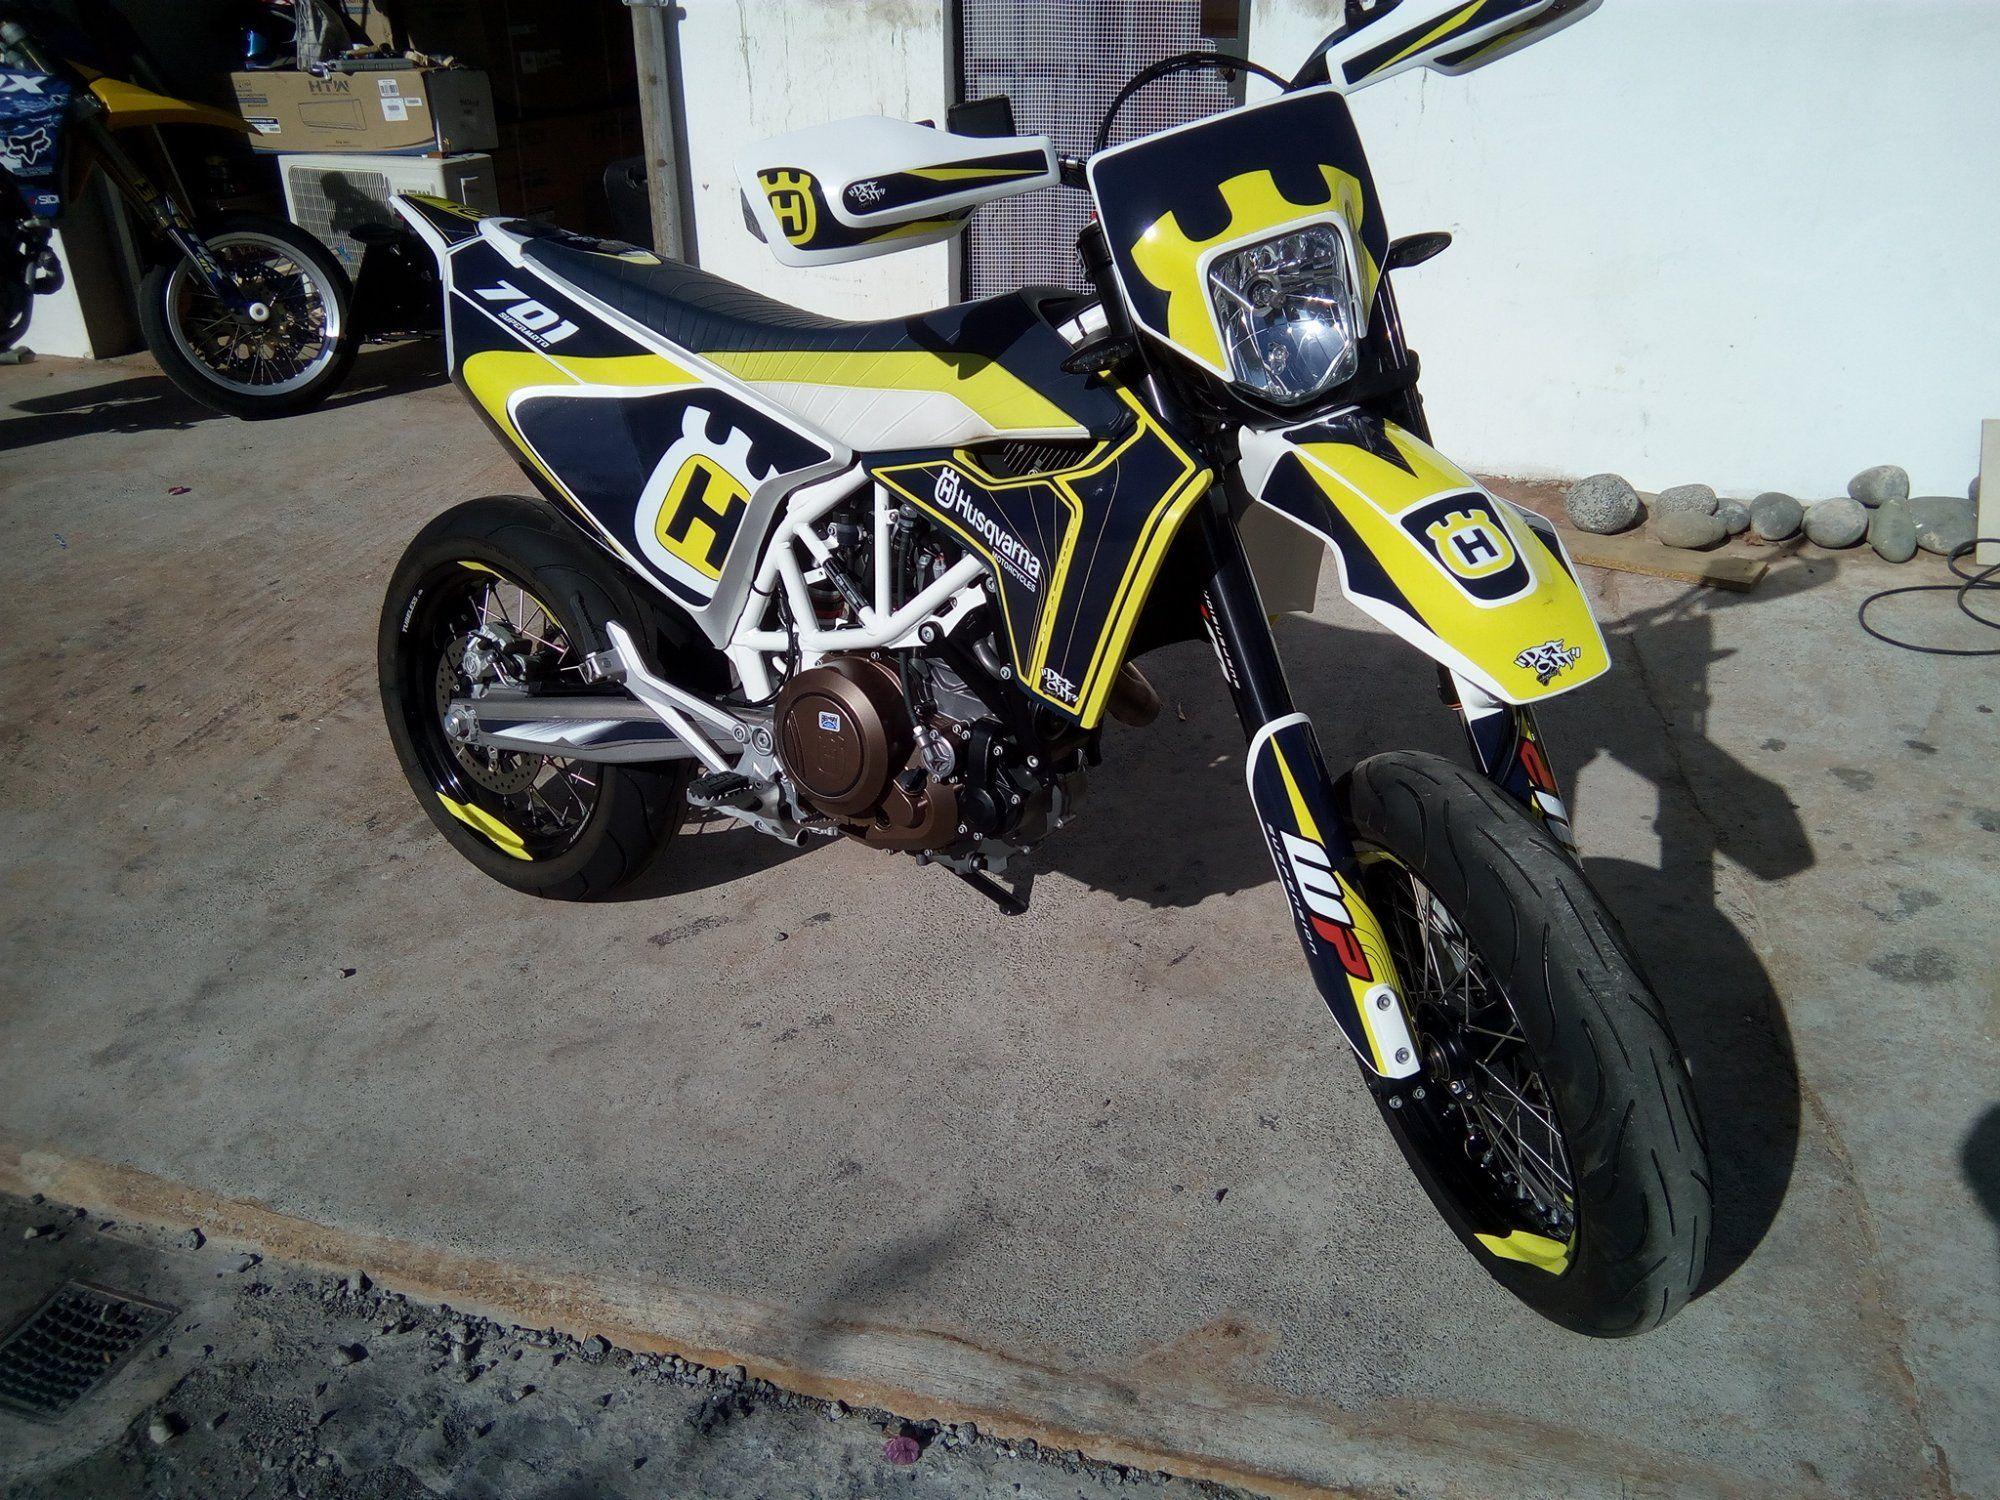 Pin Von Punpito Sanisidro Auf Sick Bikes Motorrad